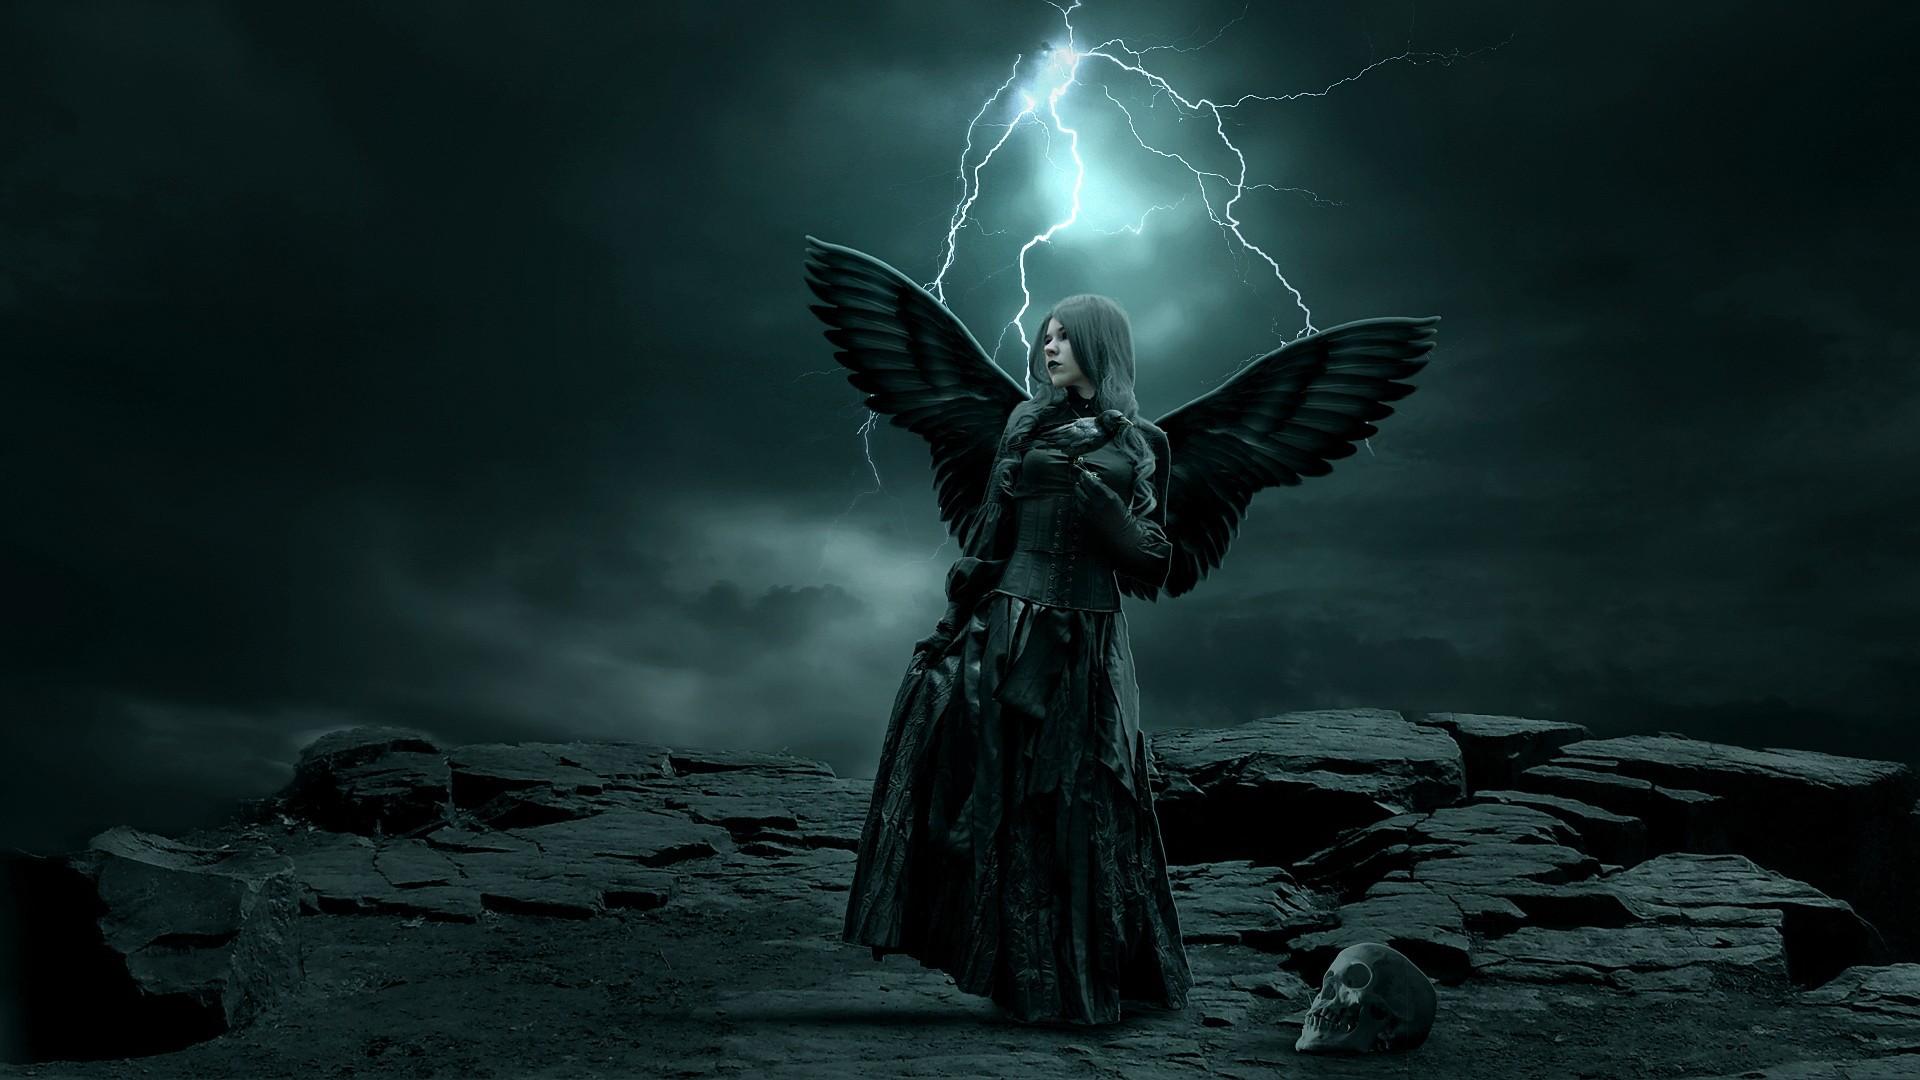 Dark - angel Wallpaper   Strange magic scary    World